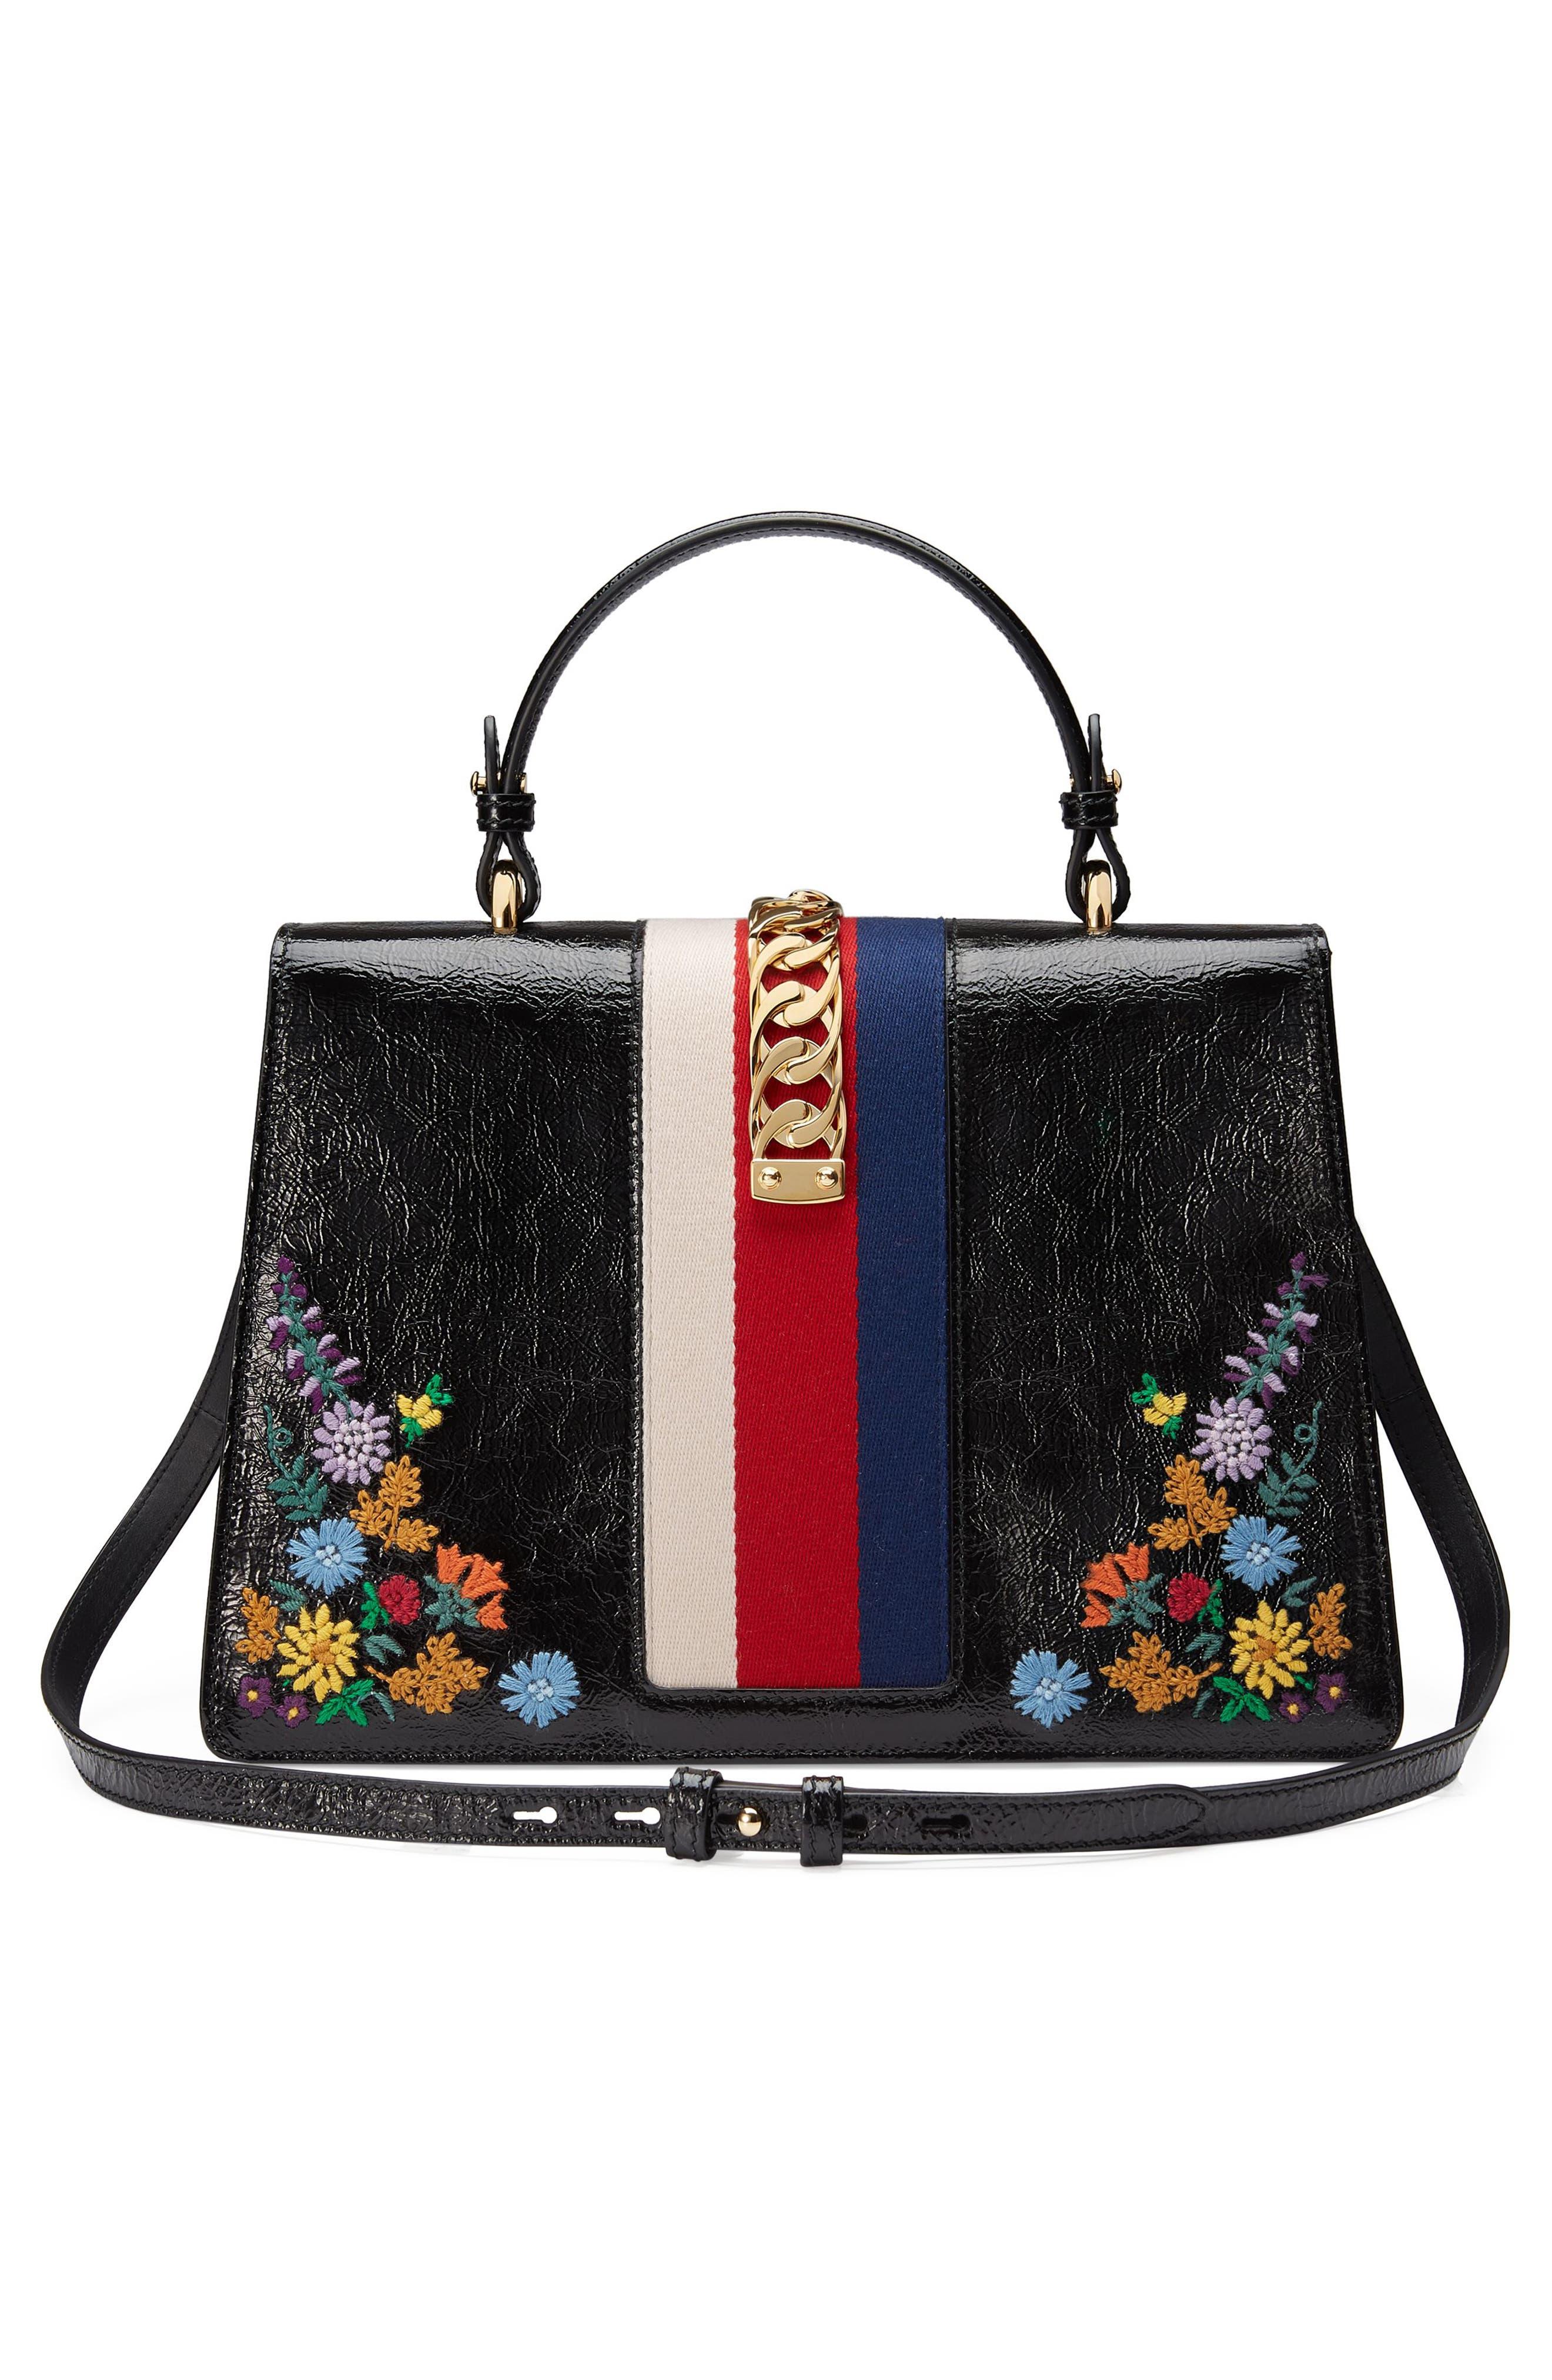 Medium Sylvie Floral Embroidered Top Handle Leather Shoulder Bag,                             Alternate thumbnail 2, color,                             Nero Multi